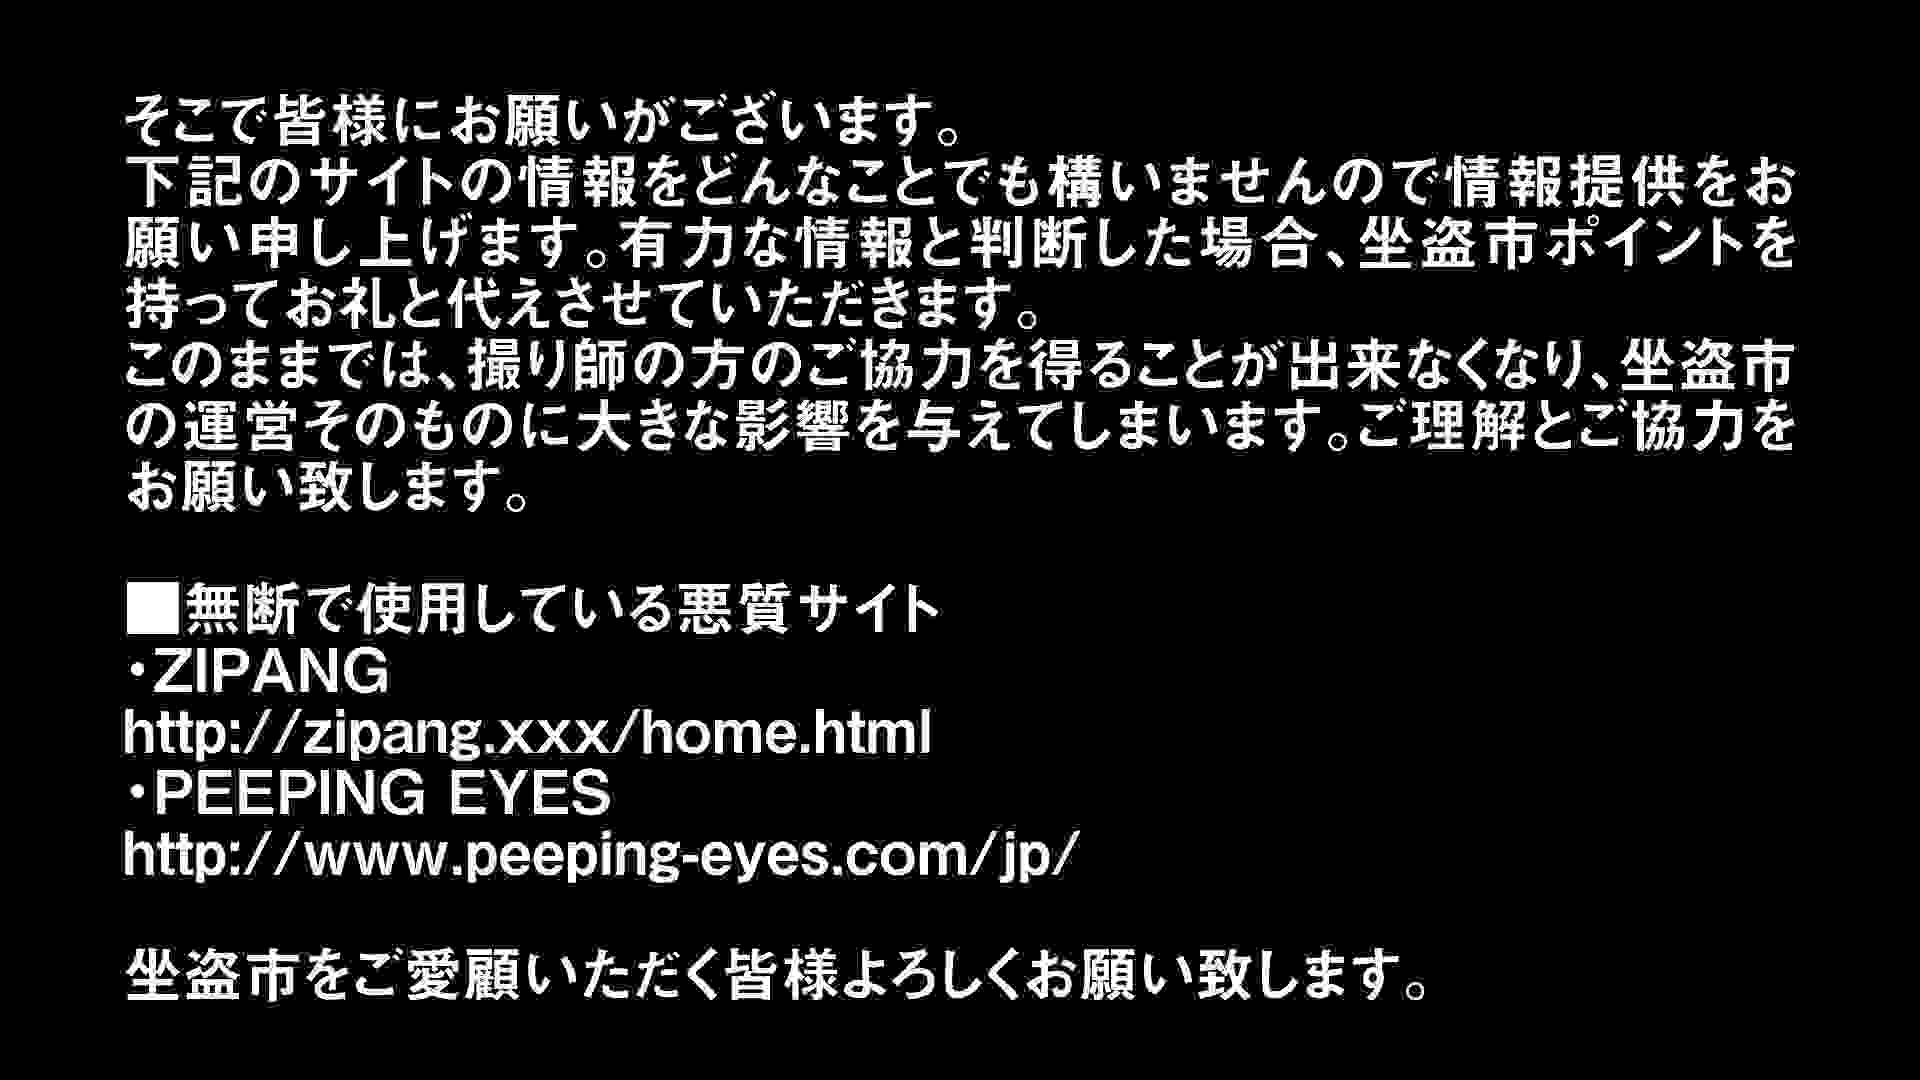 Aquaな露天風呂Vol.305 盗撮シリーズ | 露天風呂編  86PIX 3